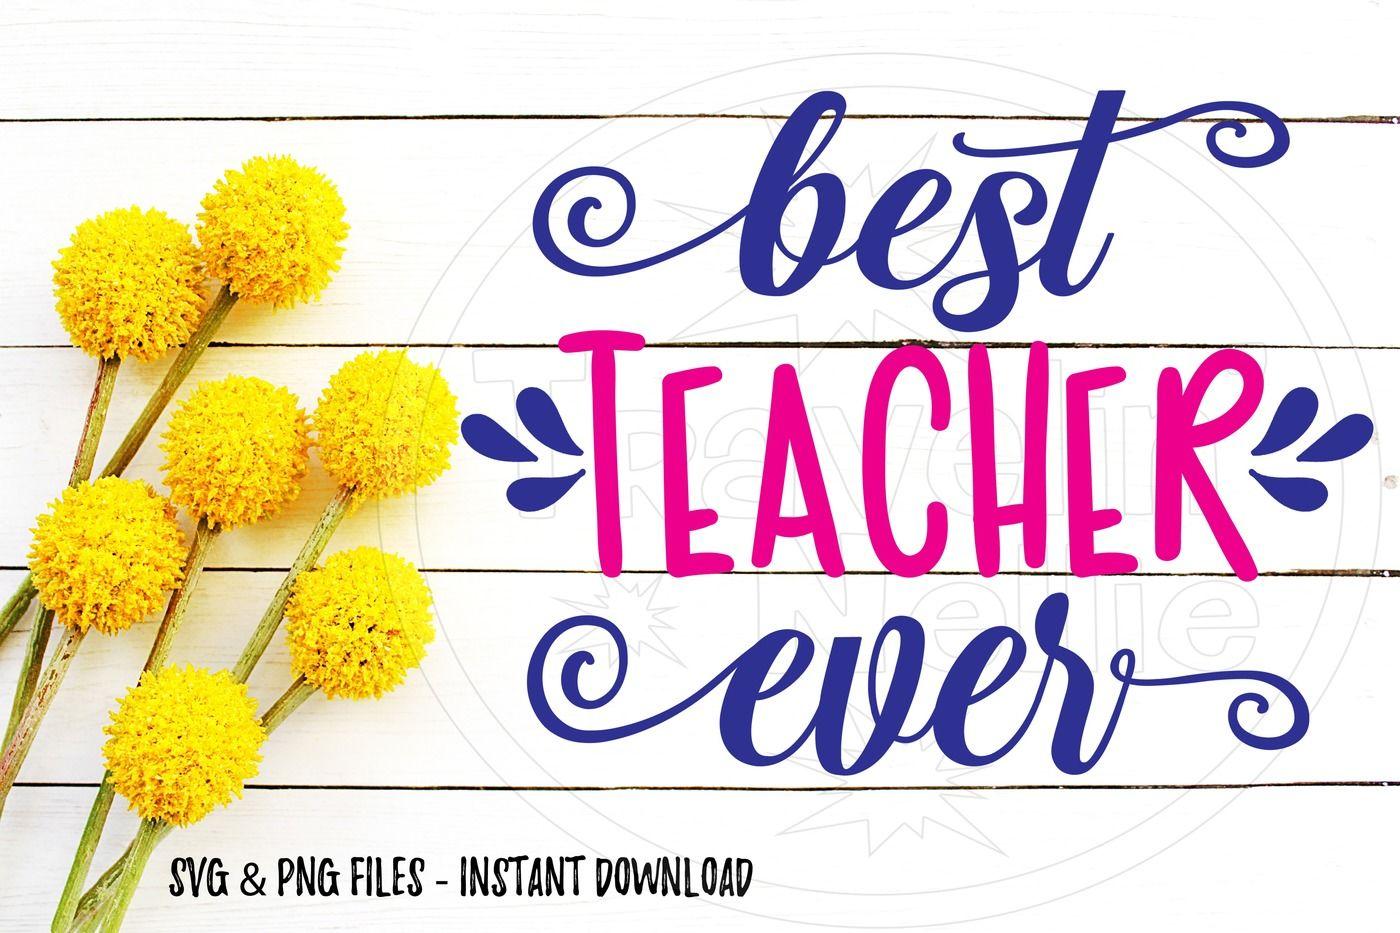 Best Teacher Ever Svg Image Print File Cut File Sublimation